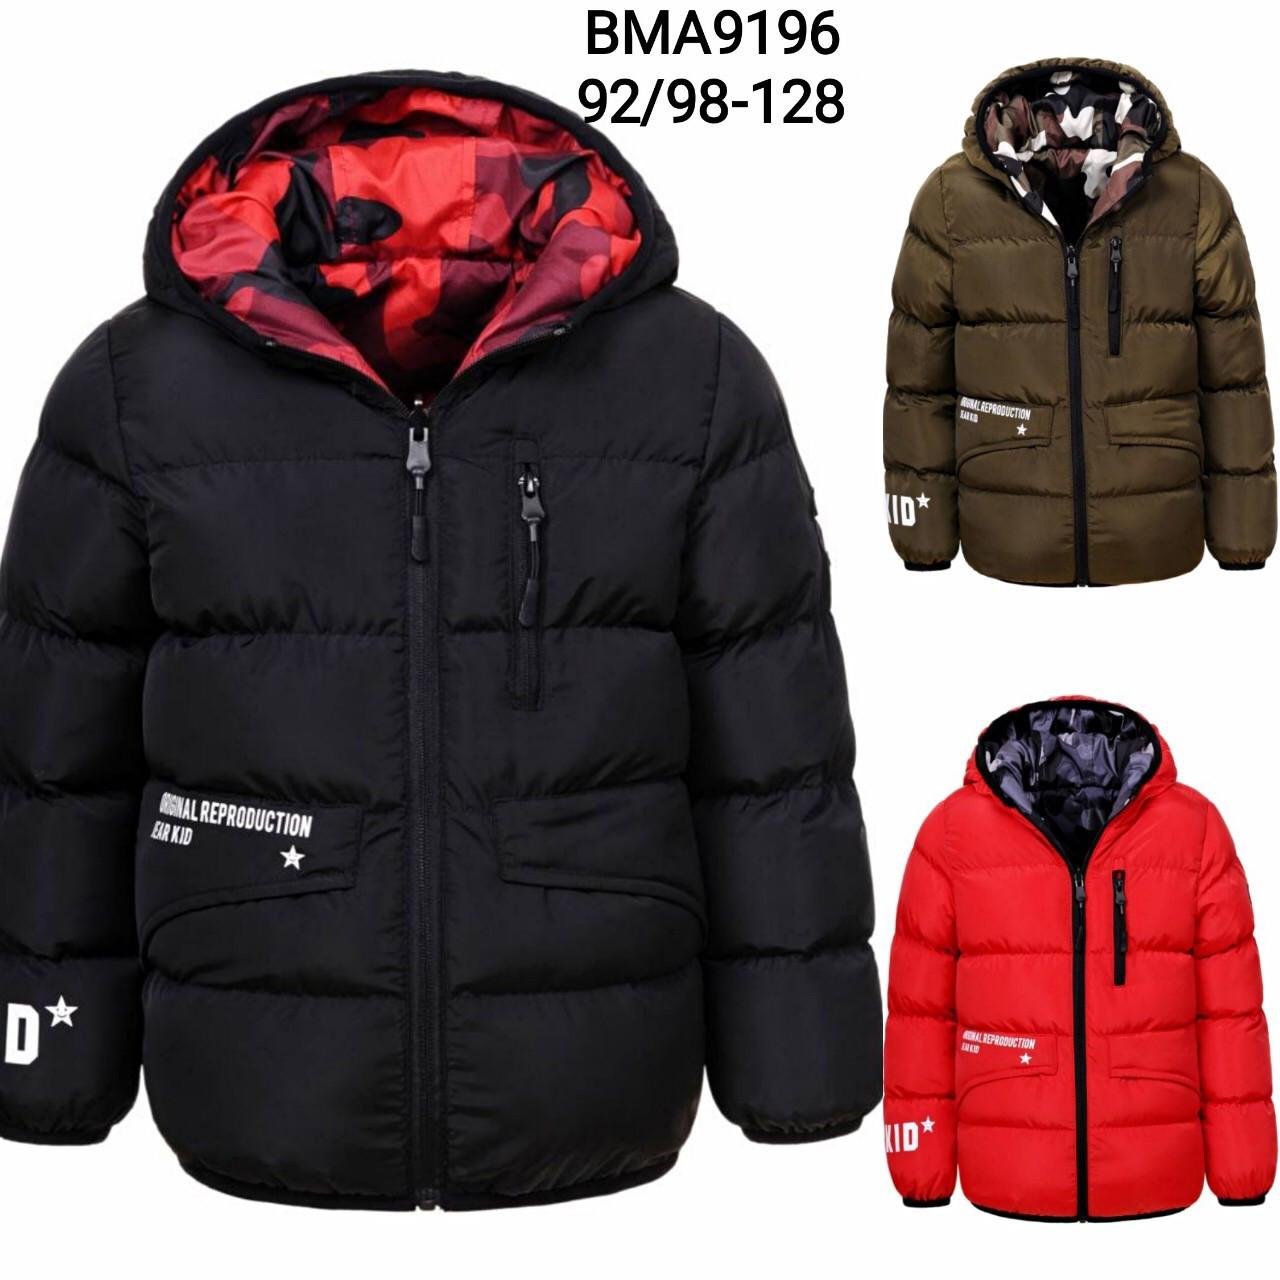 {есть:92/98} Куртка двухсторонняя для мальчиков Glo-Story, . Артикул: BMA9196 [92/98]